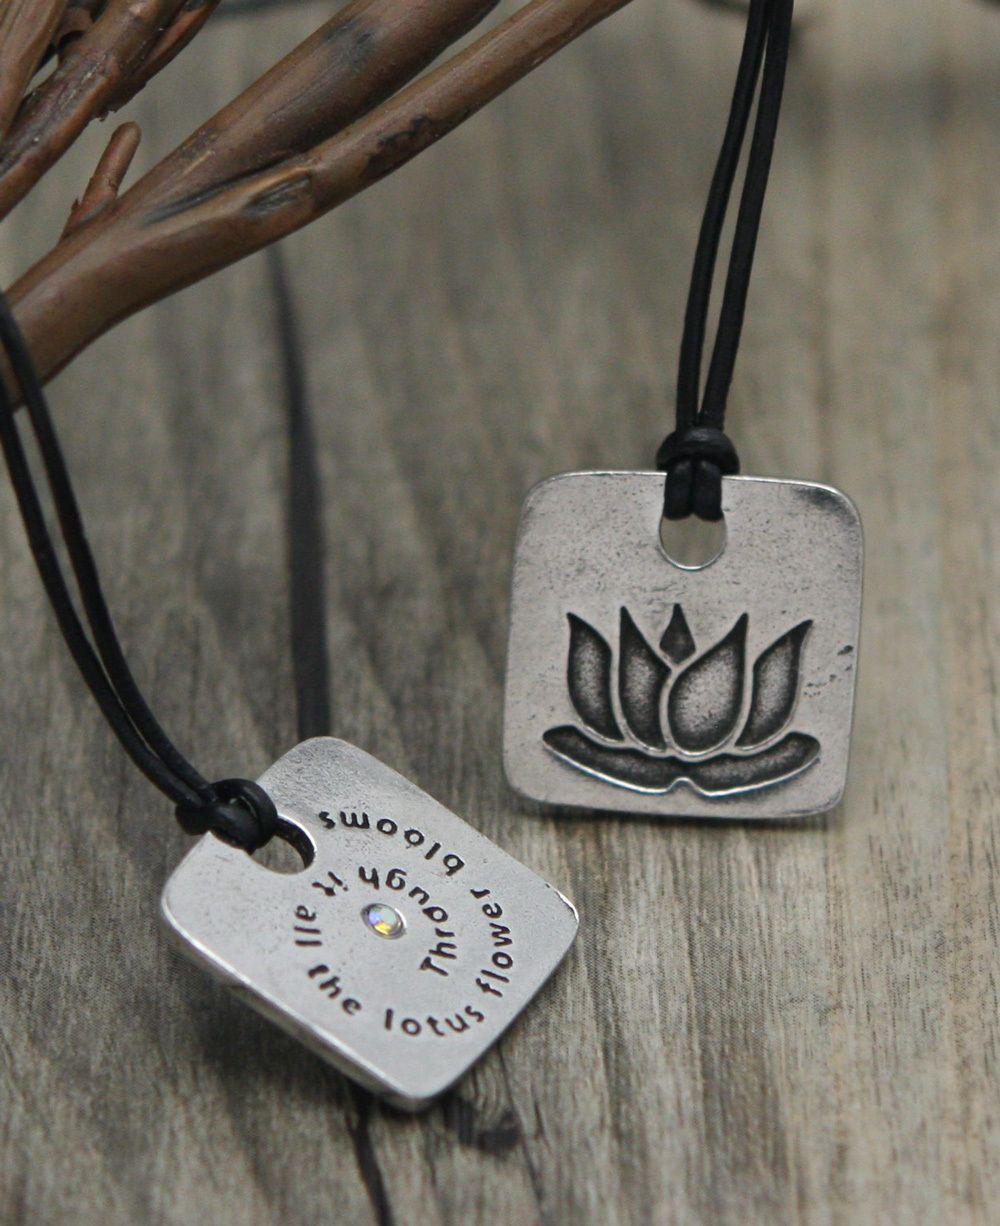 Reversible lotus pendant necklace inspirational necklace lotus reversible lotus pendant necklace inspirational necklace aloadofball Choice Image